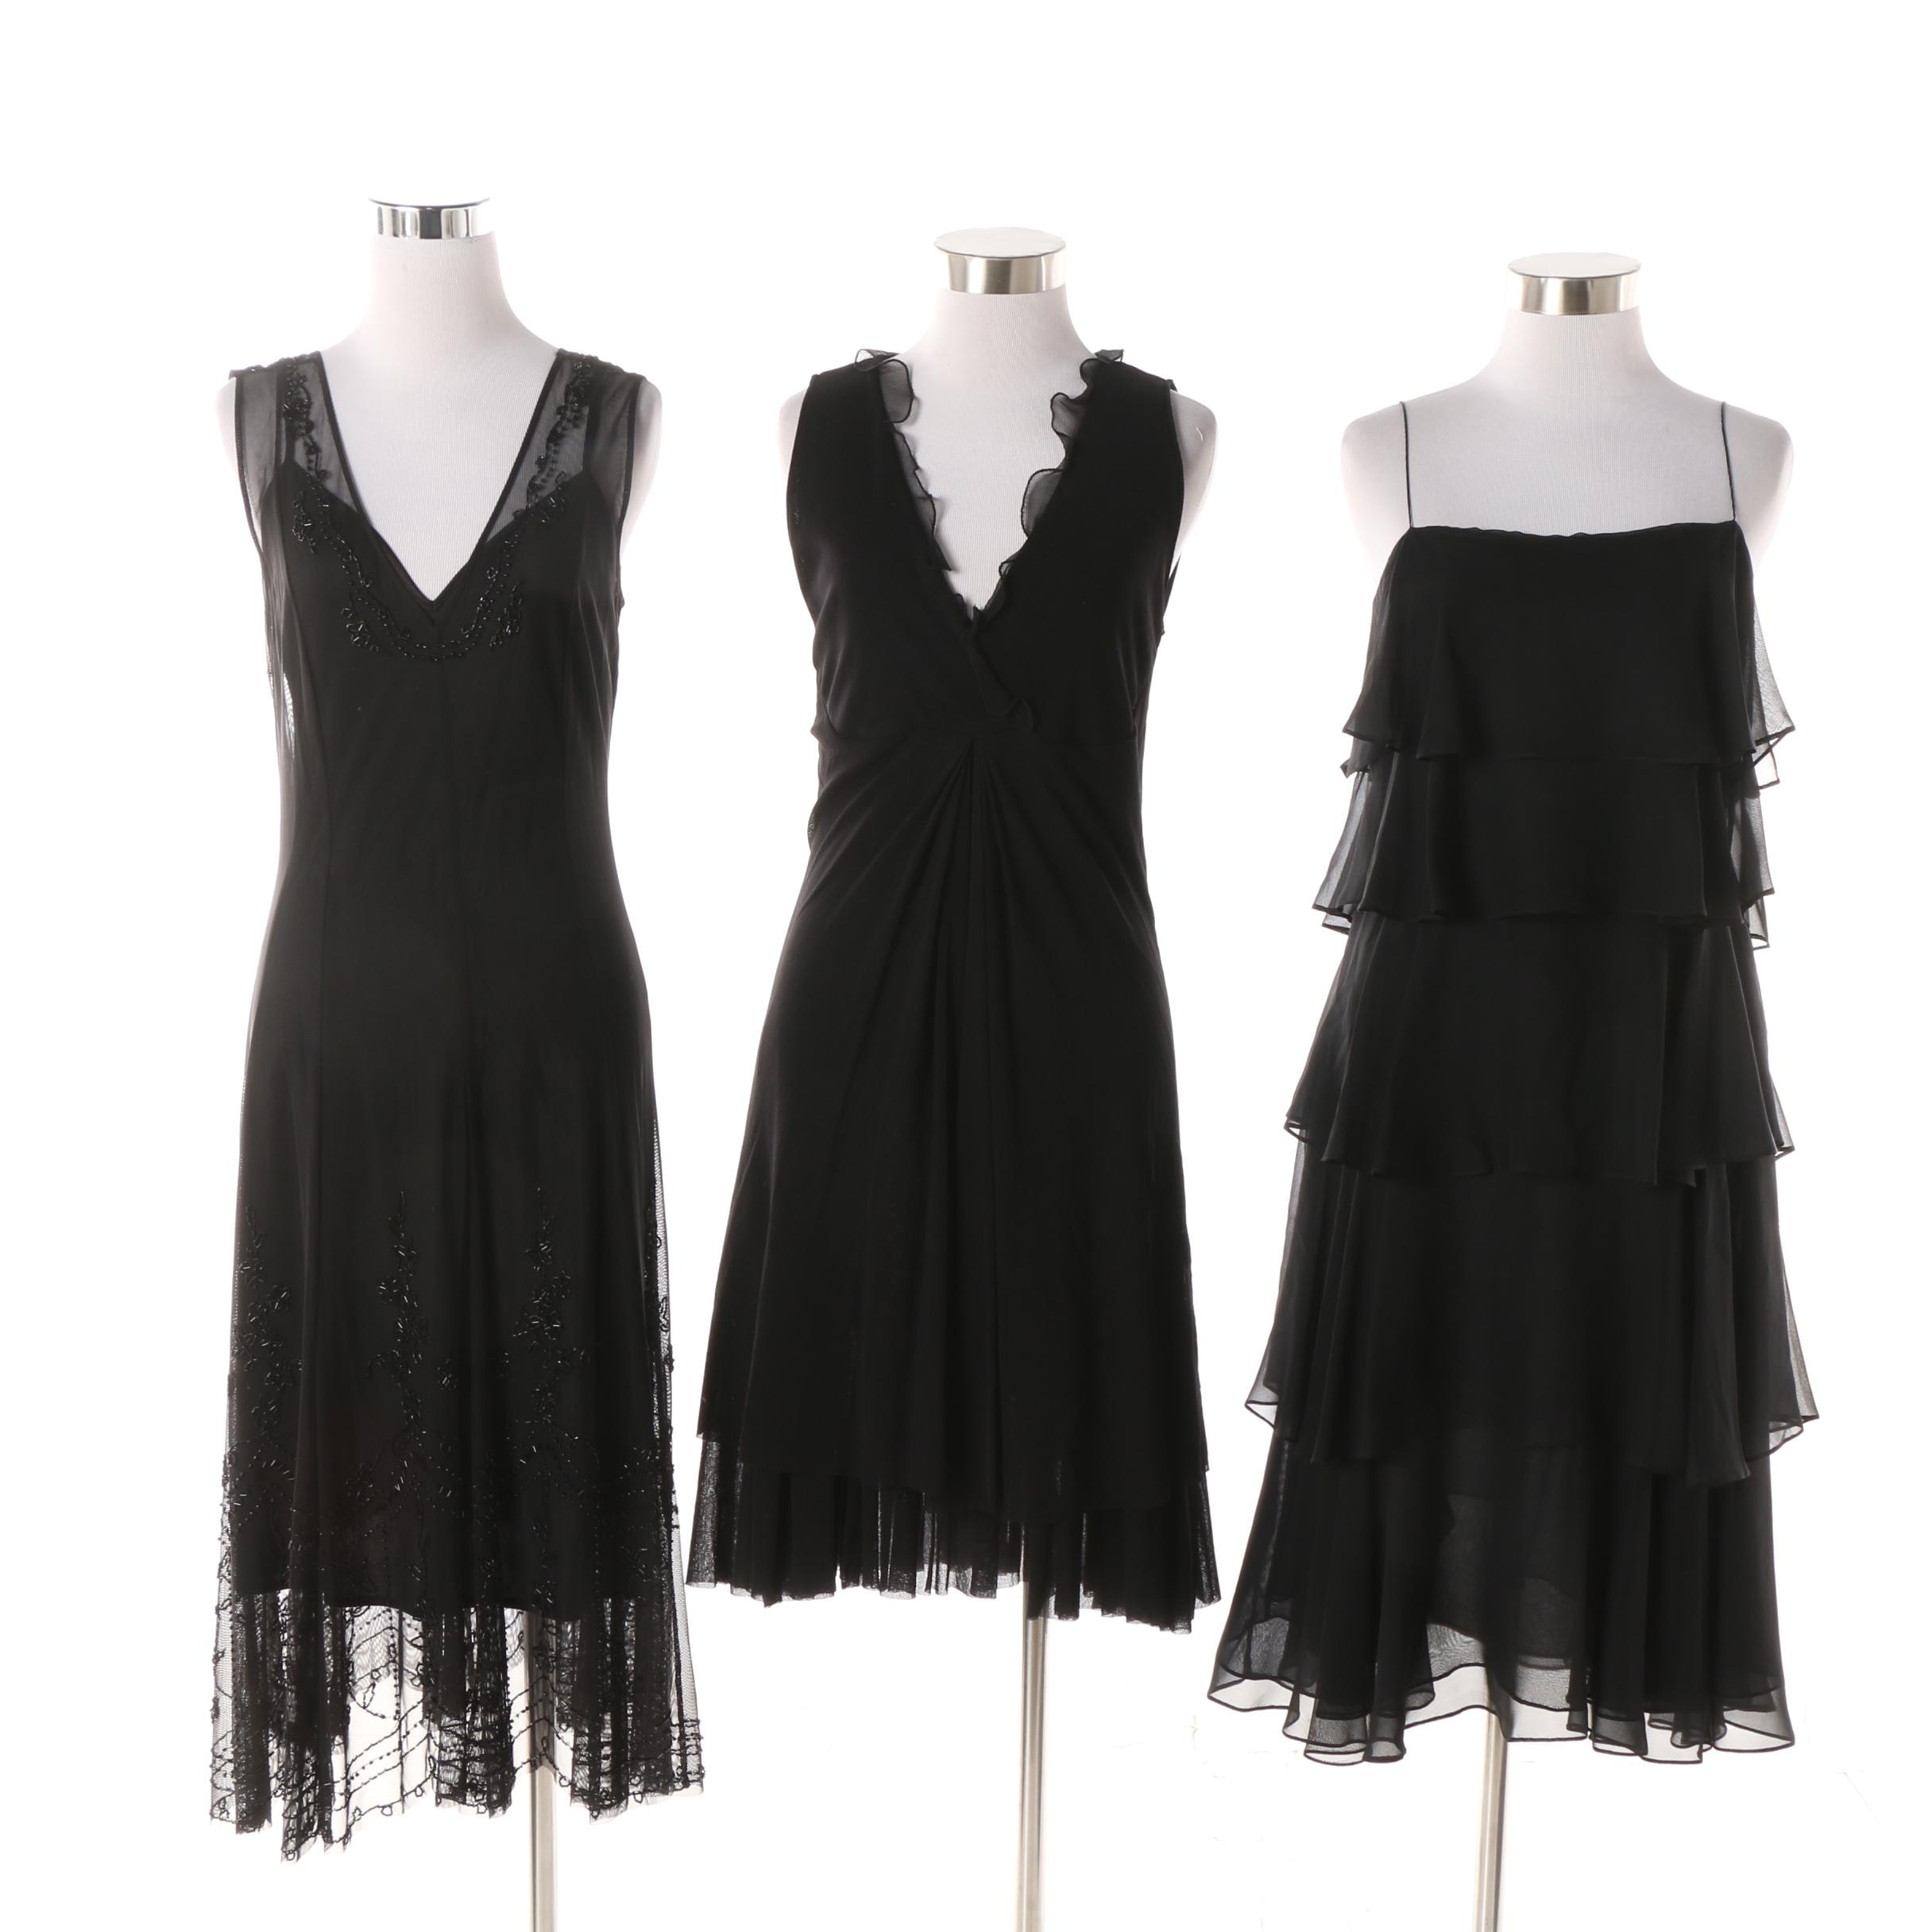 Women's Black Sleeveless Dresses including Saks Fifth Avenue